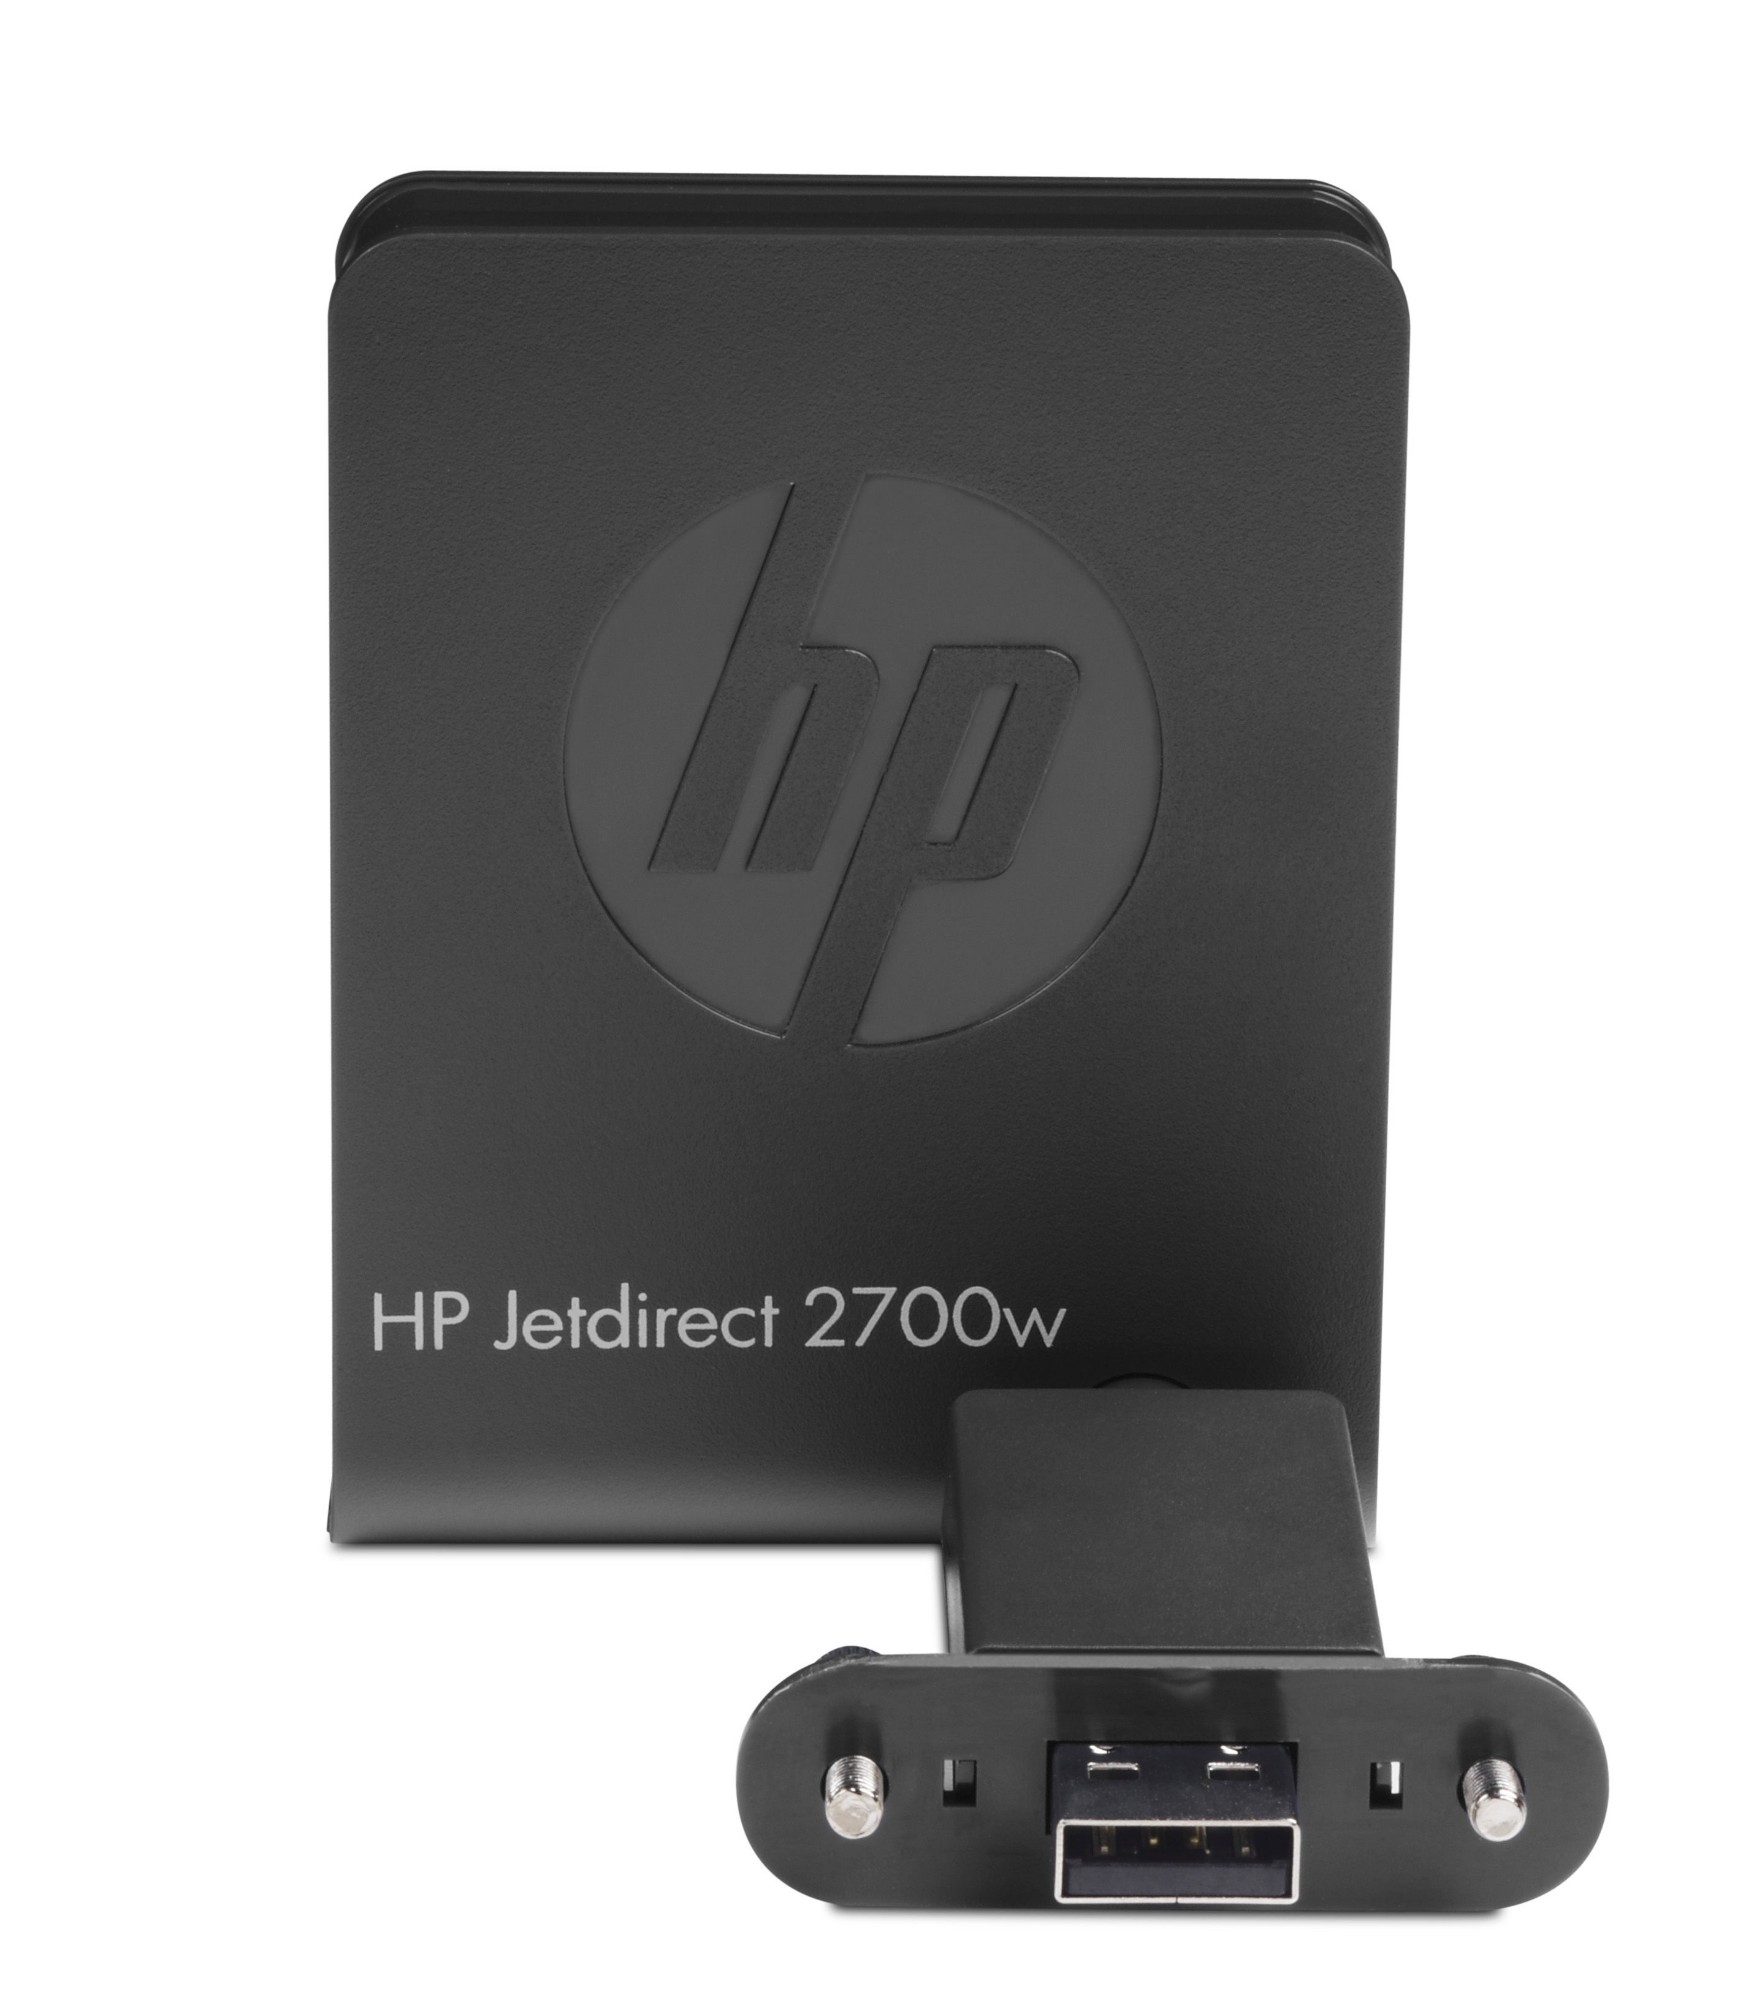 HP Jetdirect 2700w USB Wireless Print Server print server